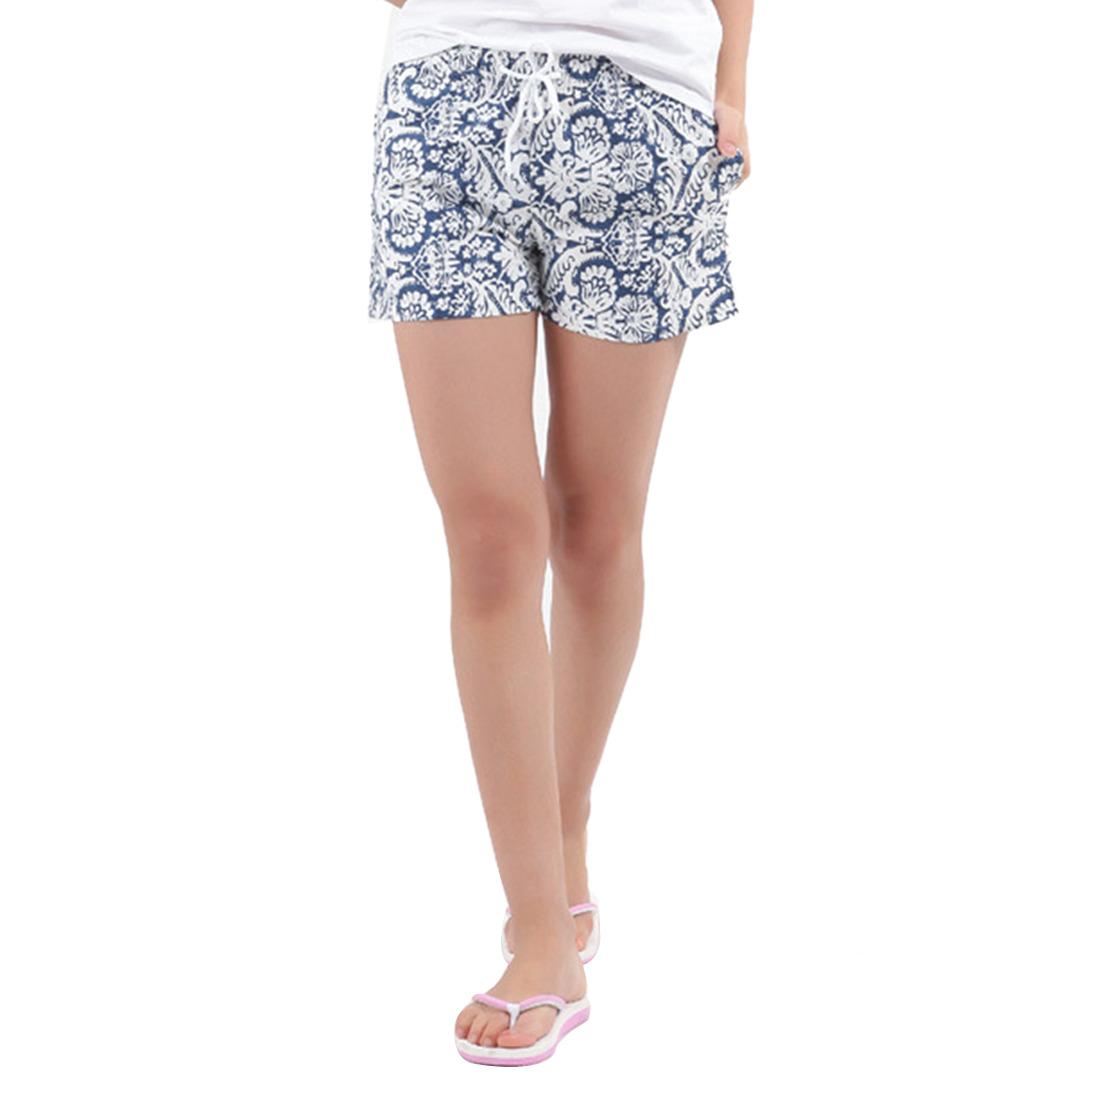 Casual Womens Printed Swim Beach Shorts Boardshorts Trunks Short Pants L/XL/XXL